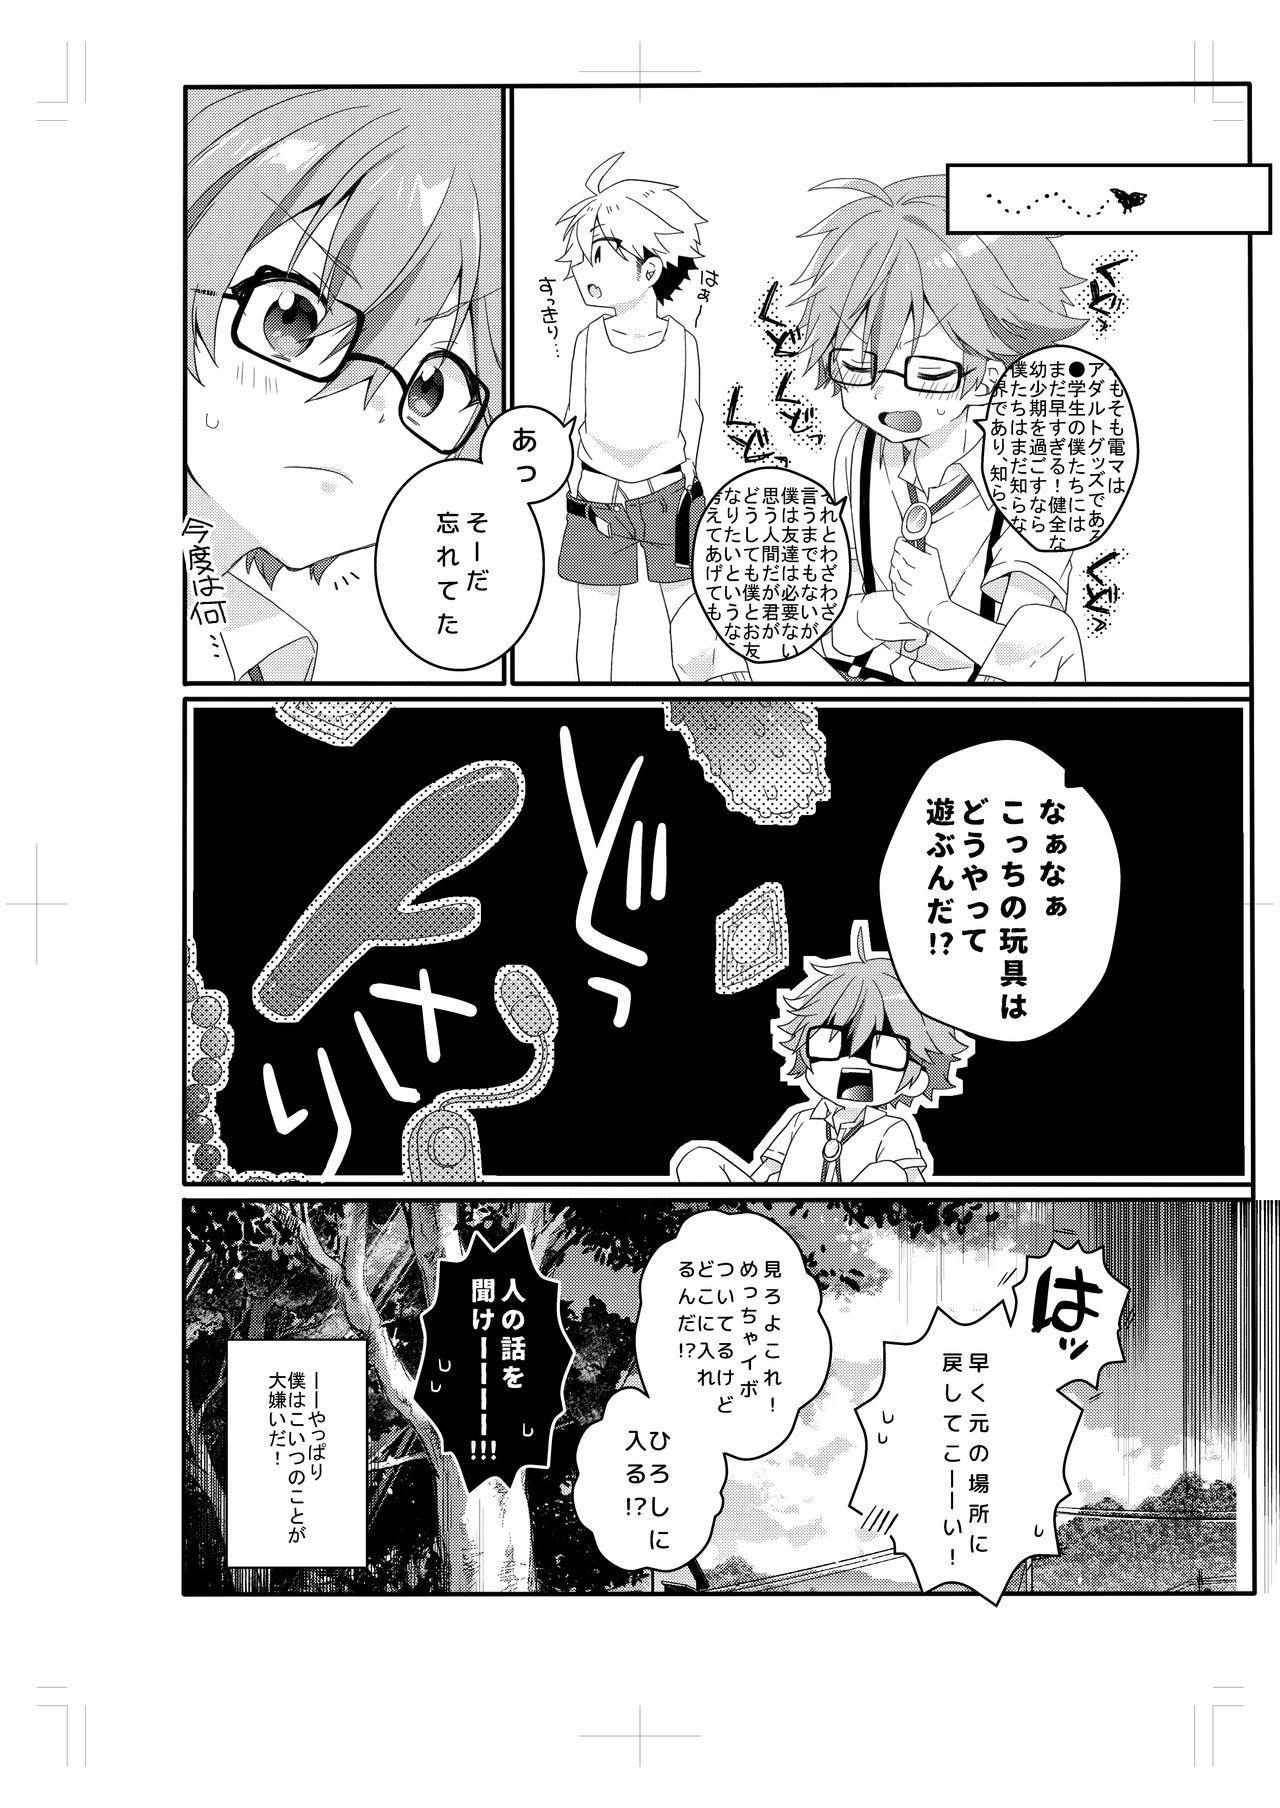 Shota Sextet Vol. 1 52